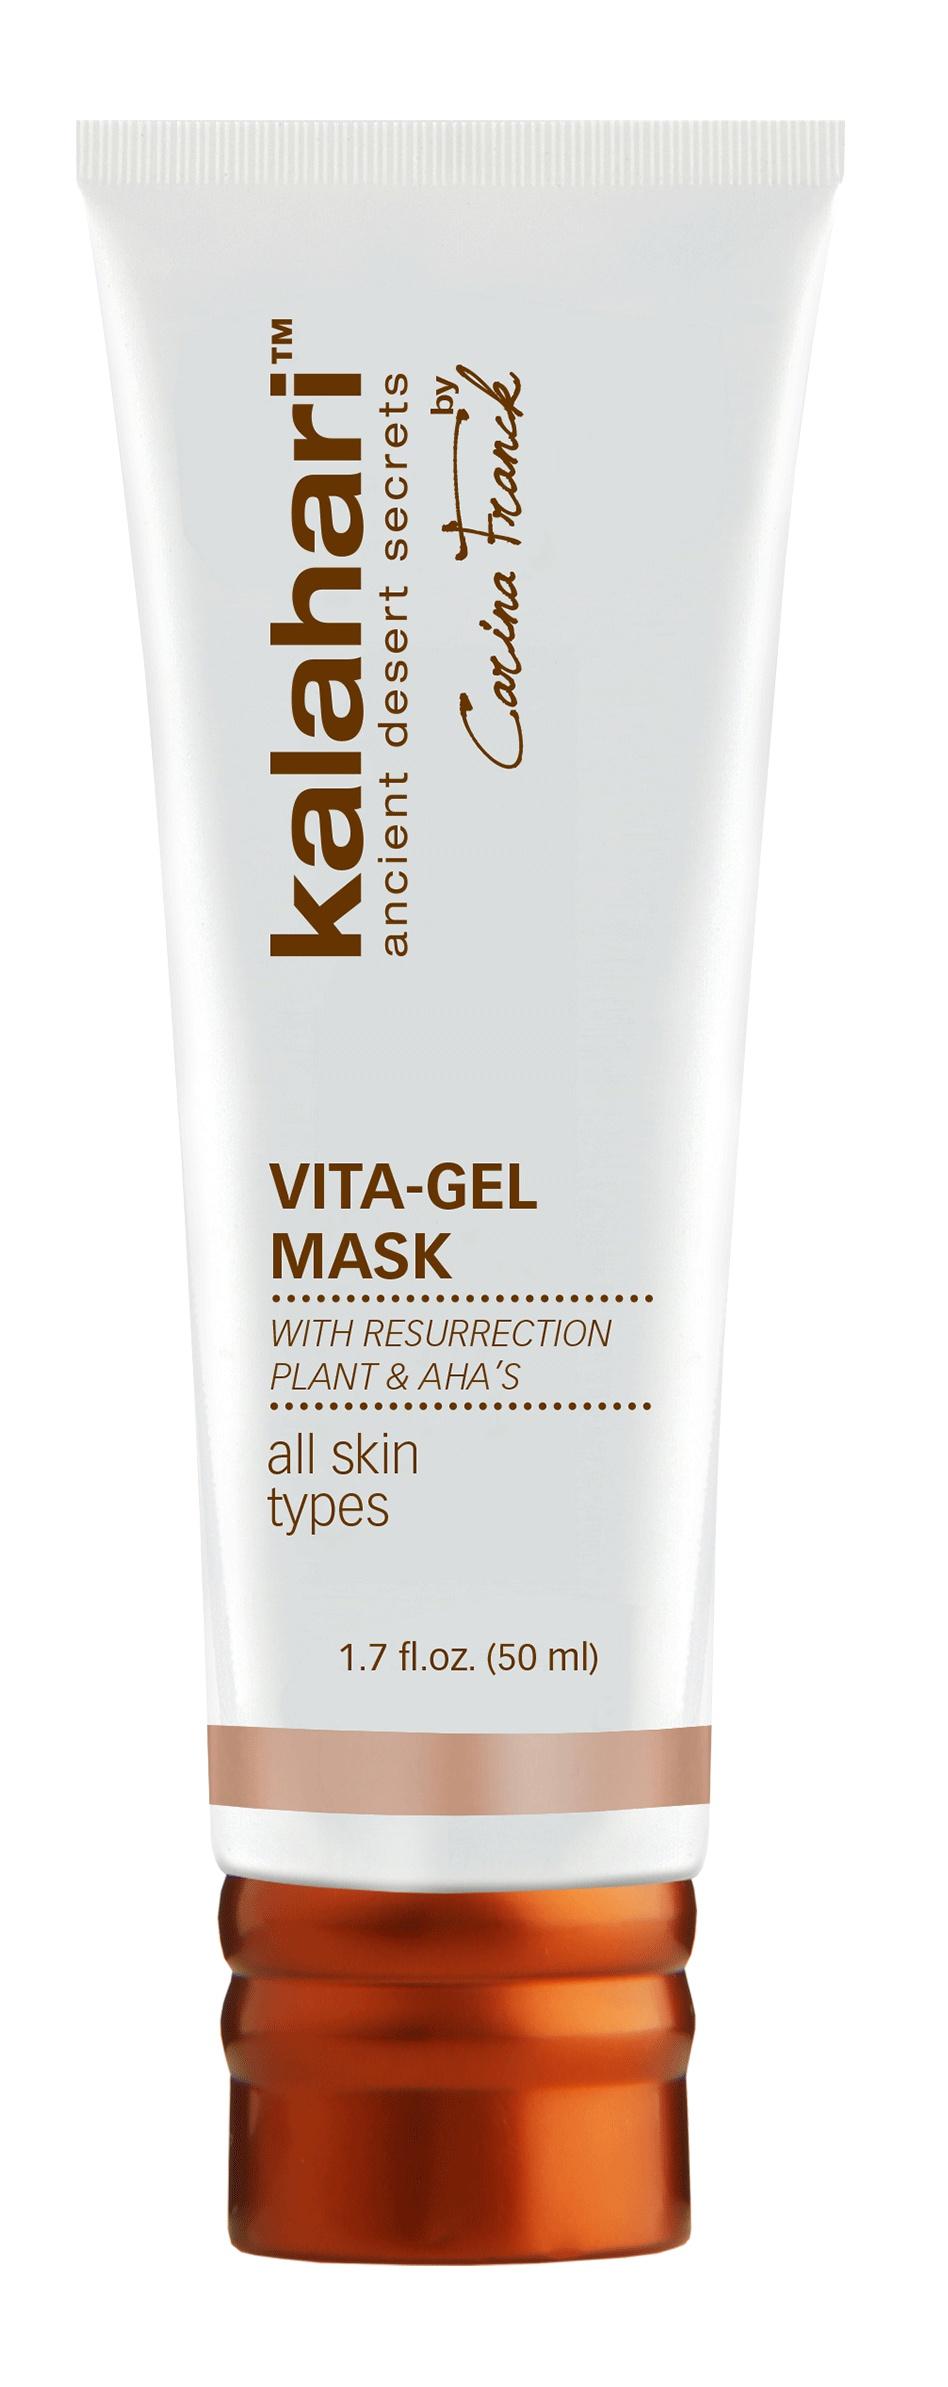 Kalahari Vita-Gel Mask